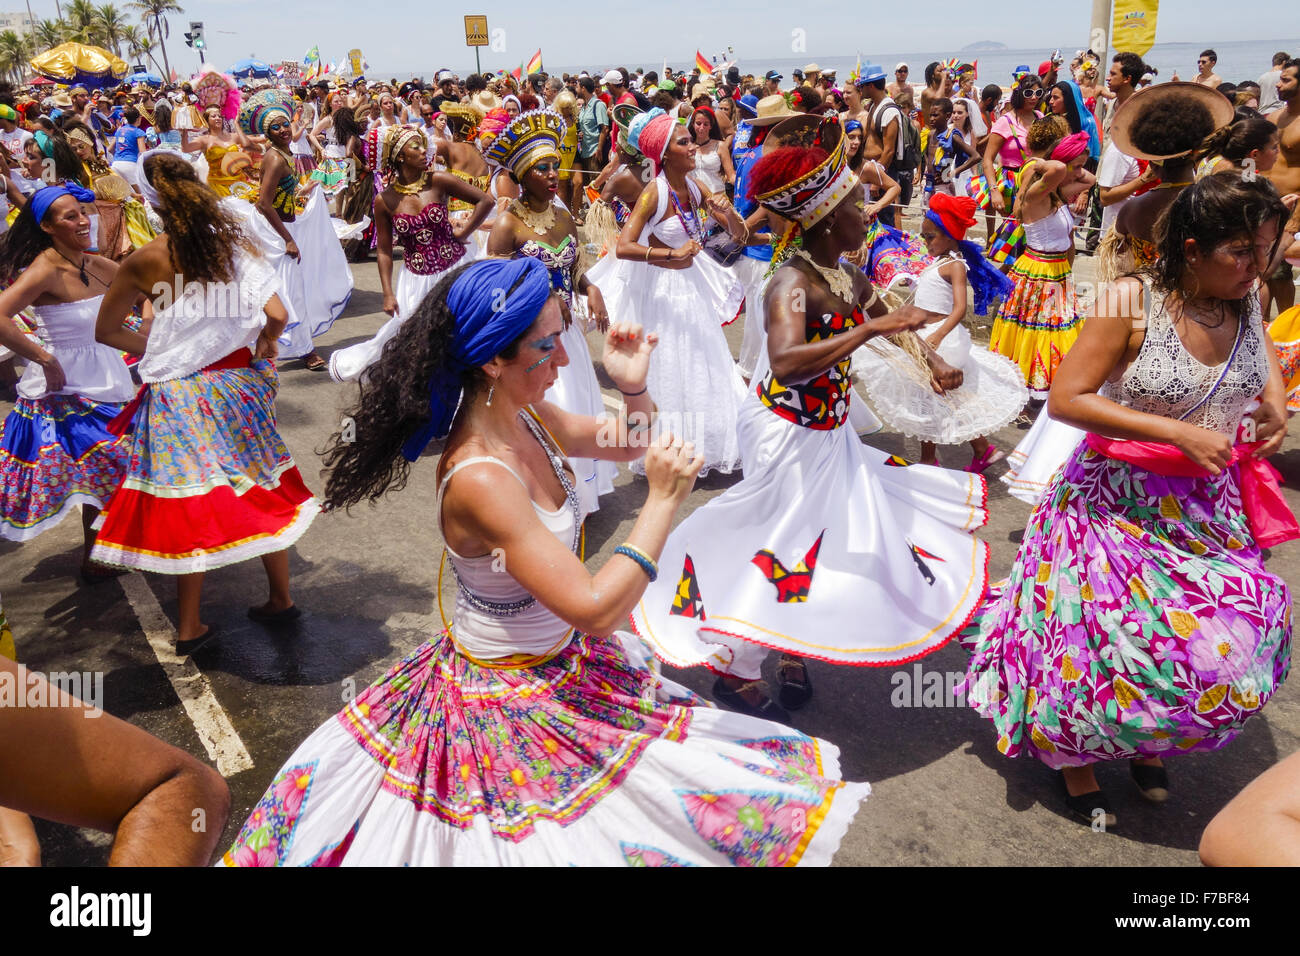 Rio de Janeiro, Ipanema Beach, Street carnival, Brazil - Stock Image